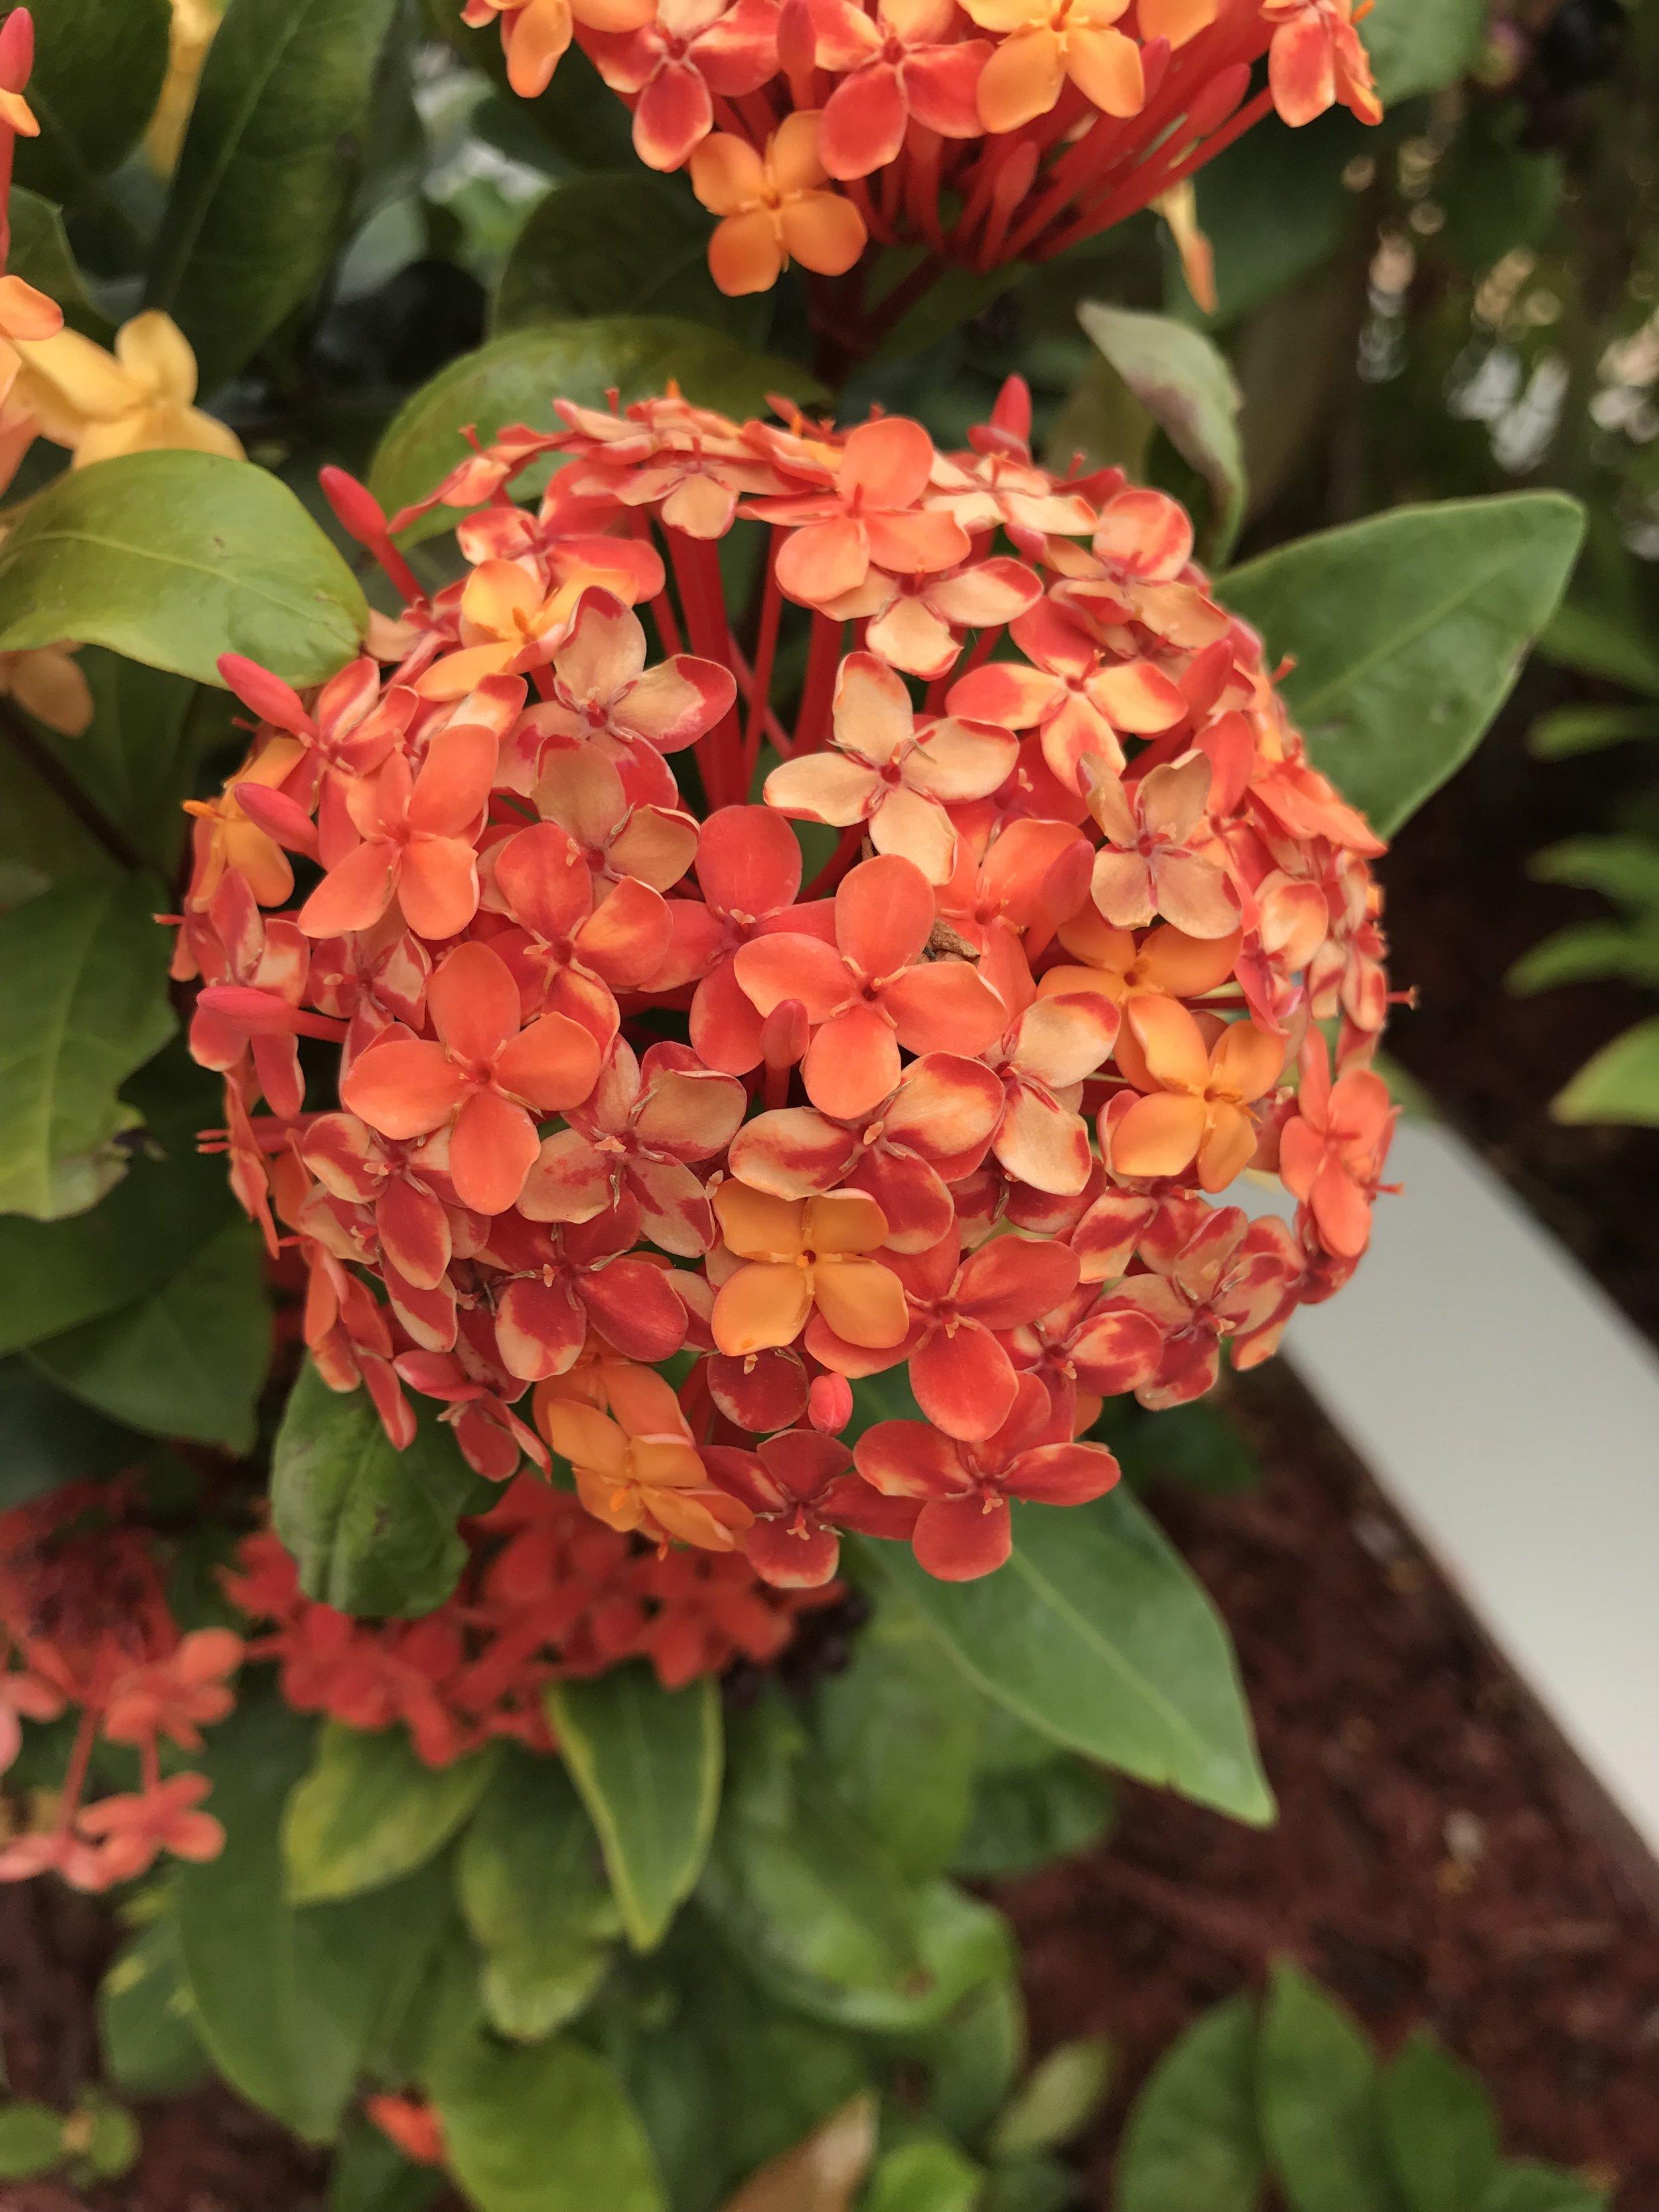 Ixora Ixora Coccinea - West Indian Jasmine